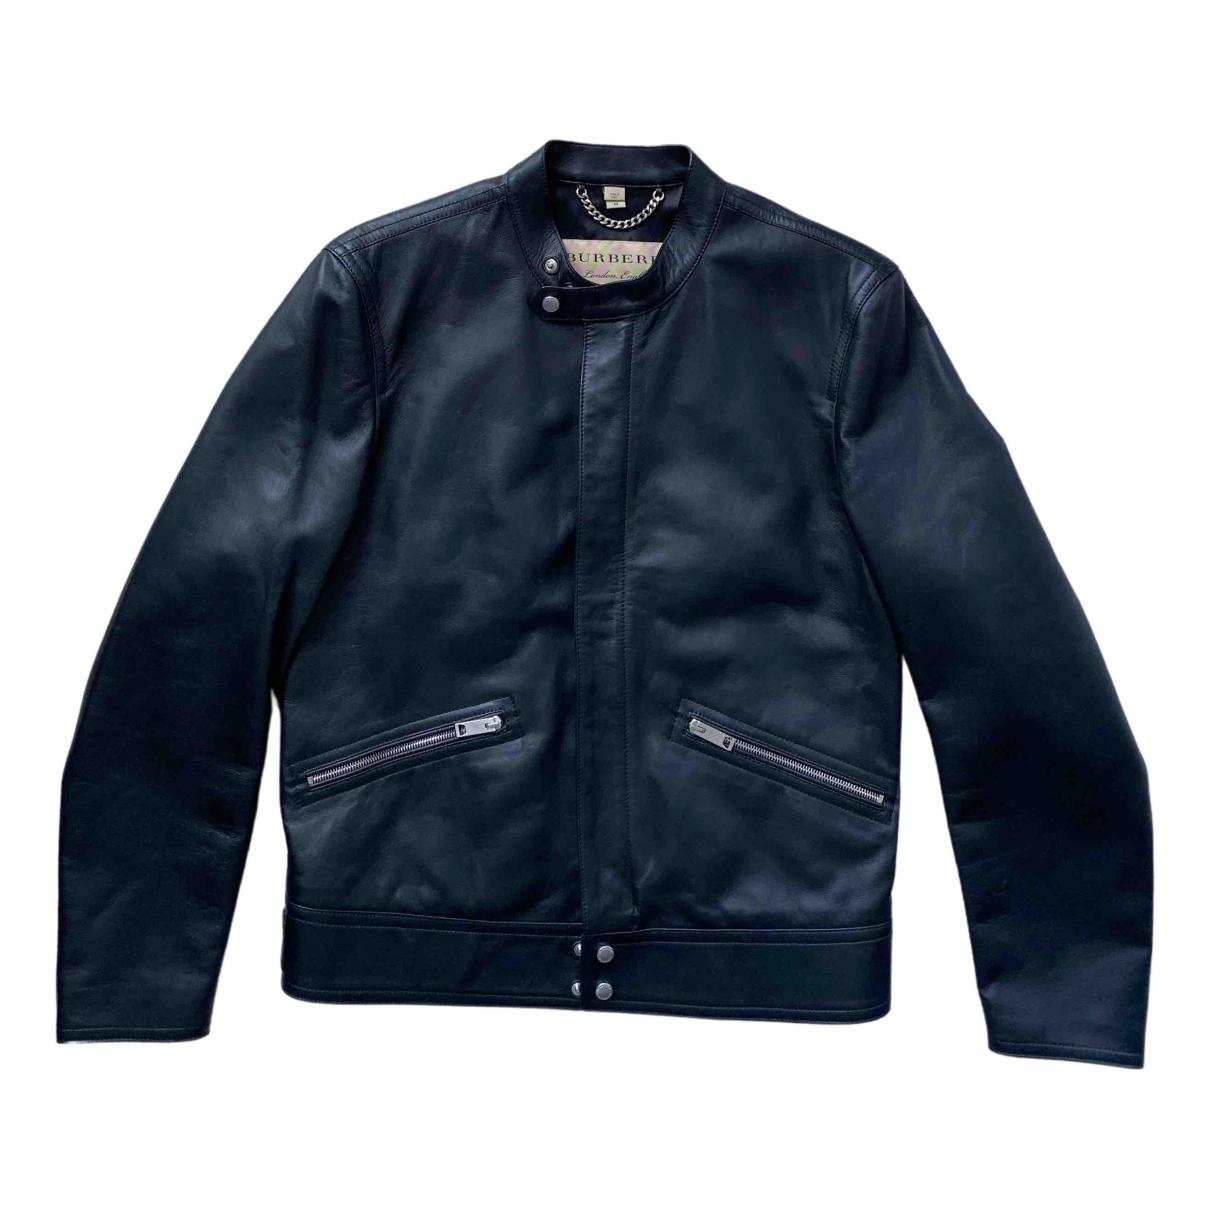 Burberry \N Jacke in  Schwarz Leder